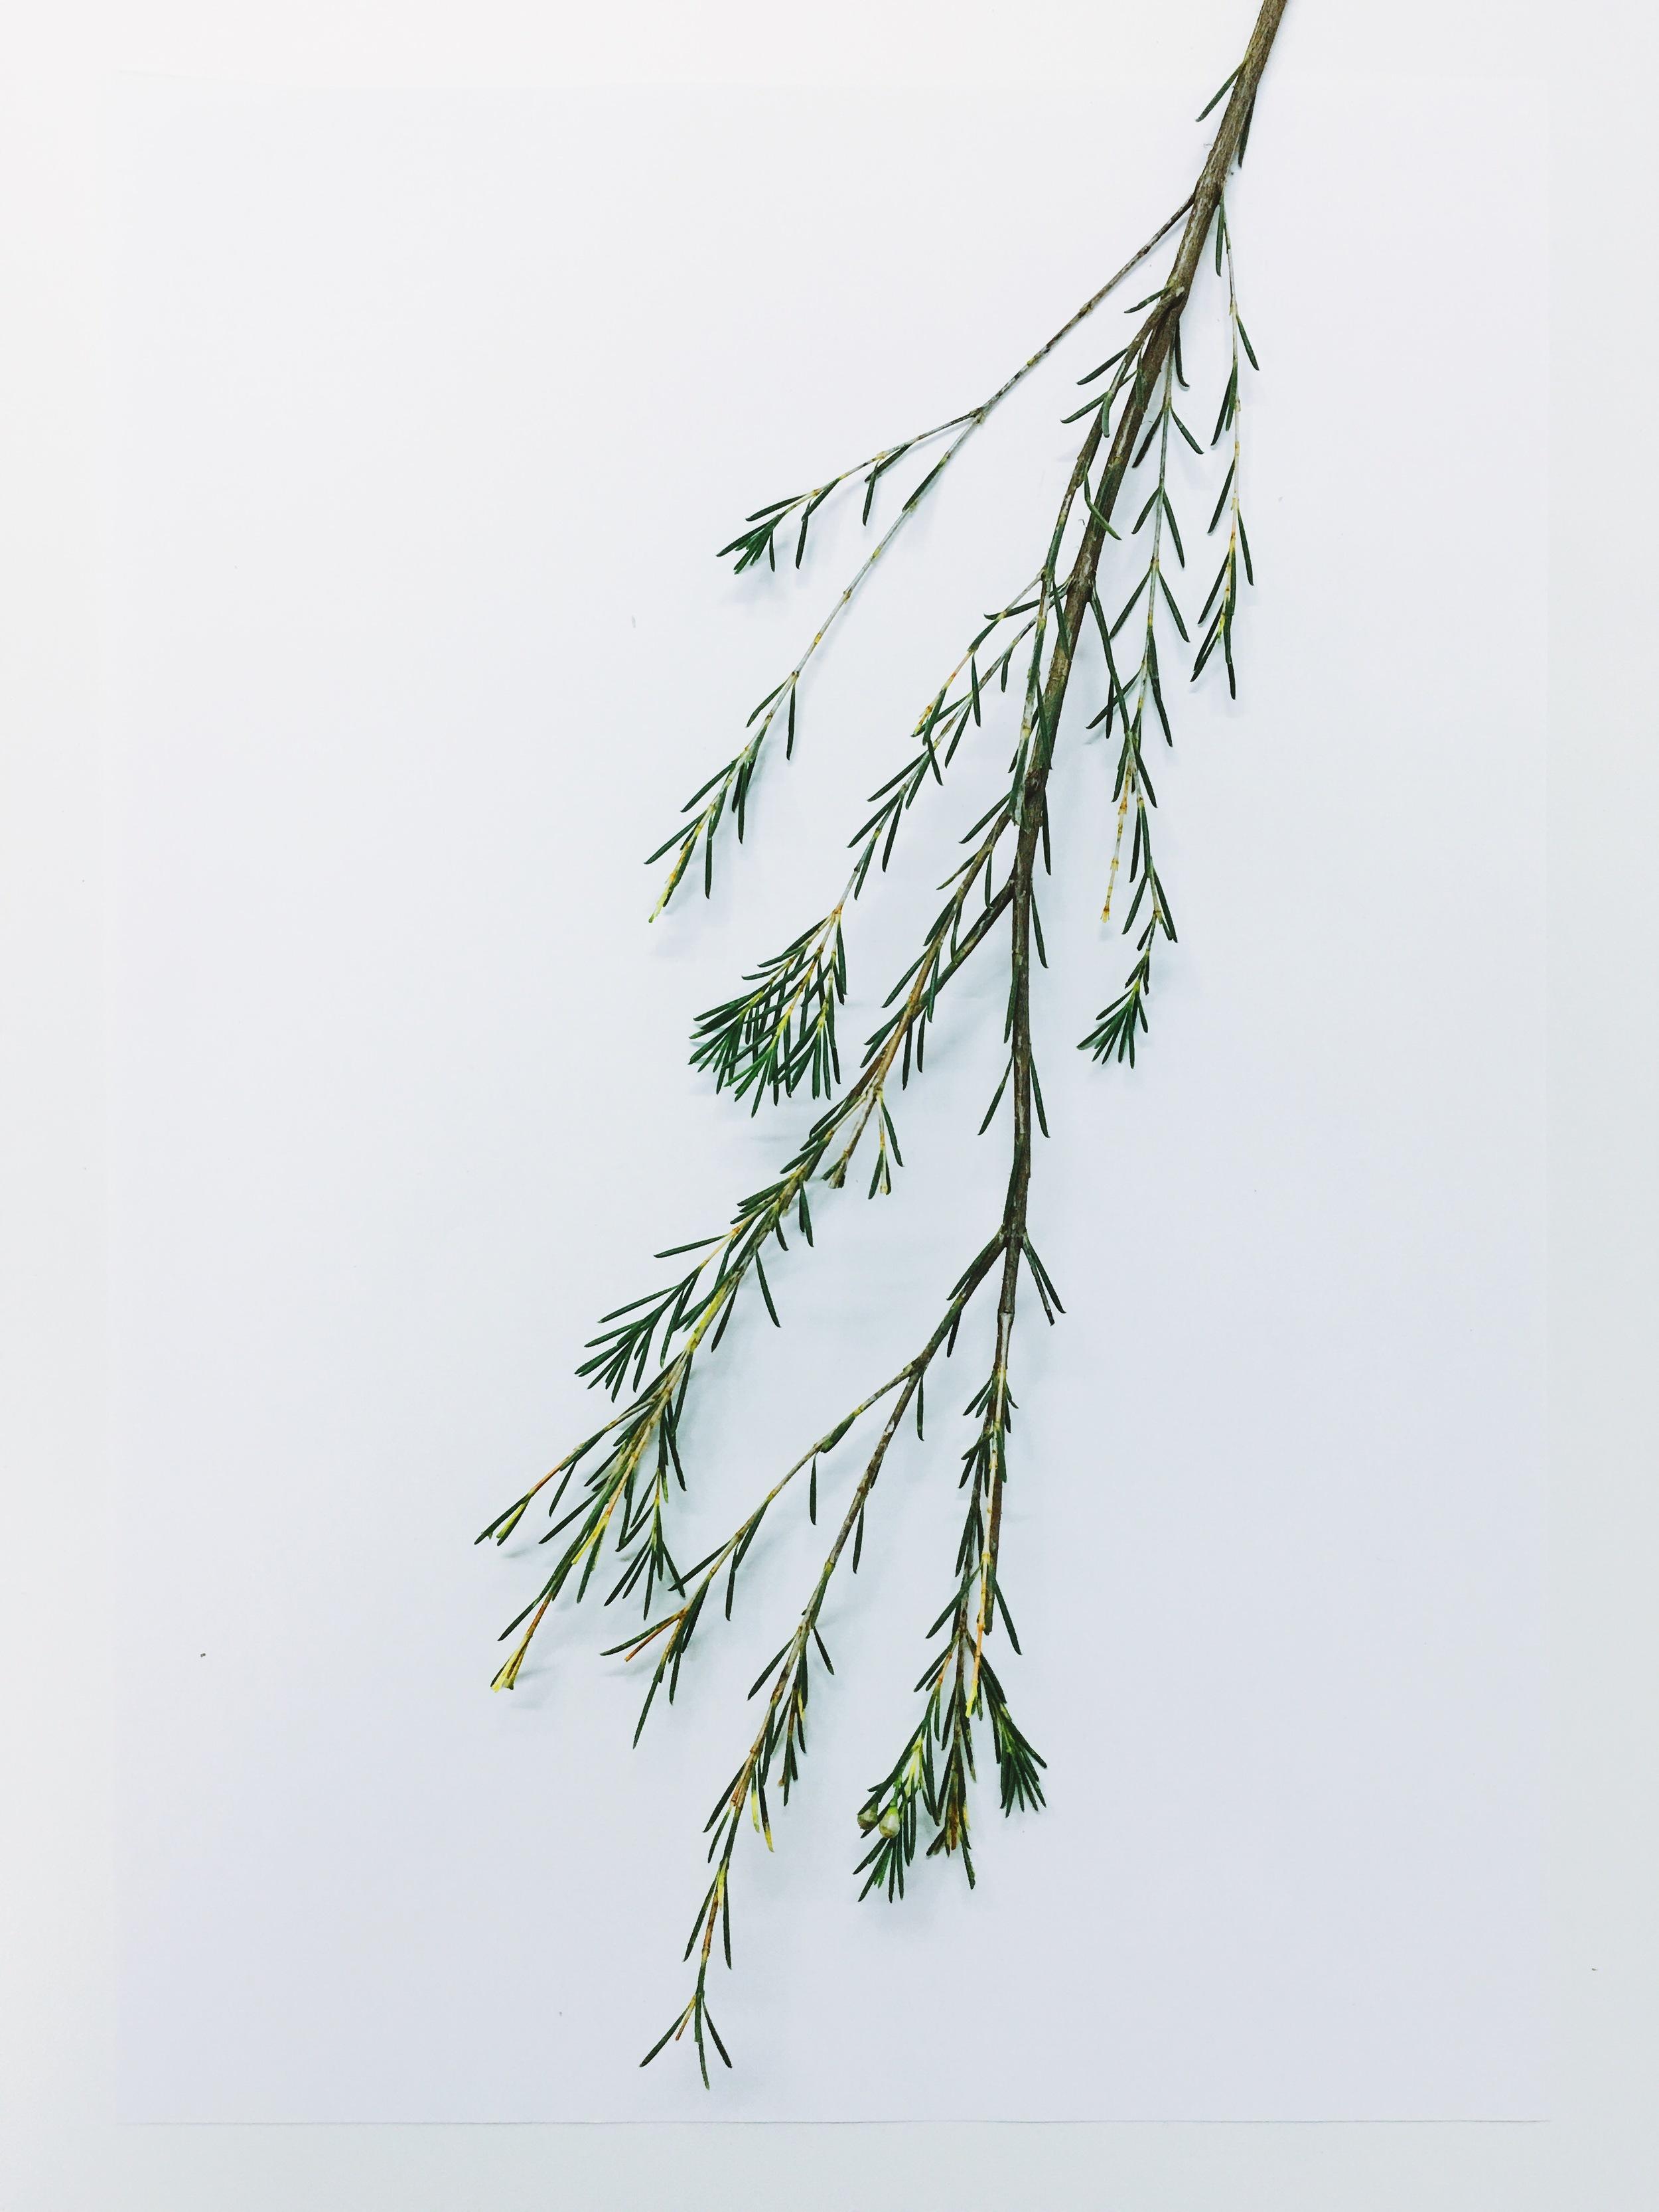 Cindy Lin Flower Drawing 5.jpg